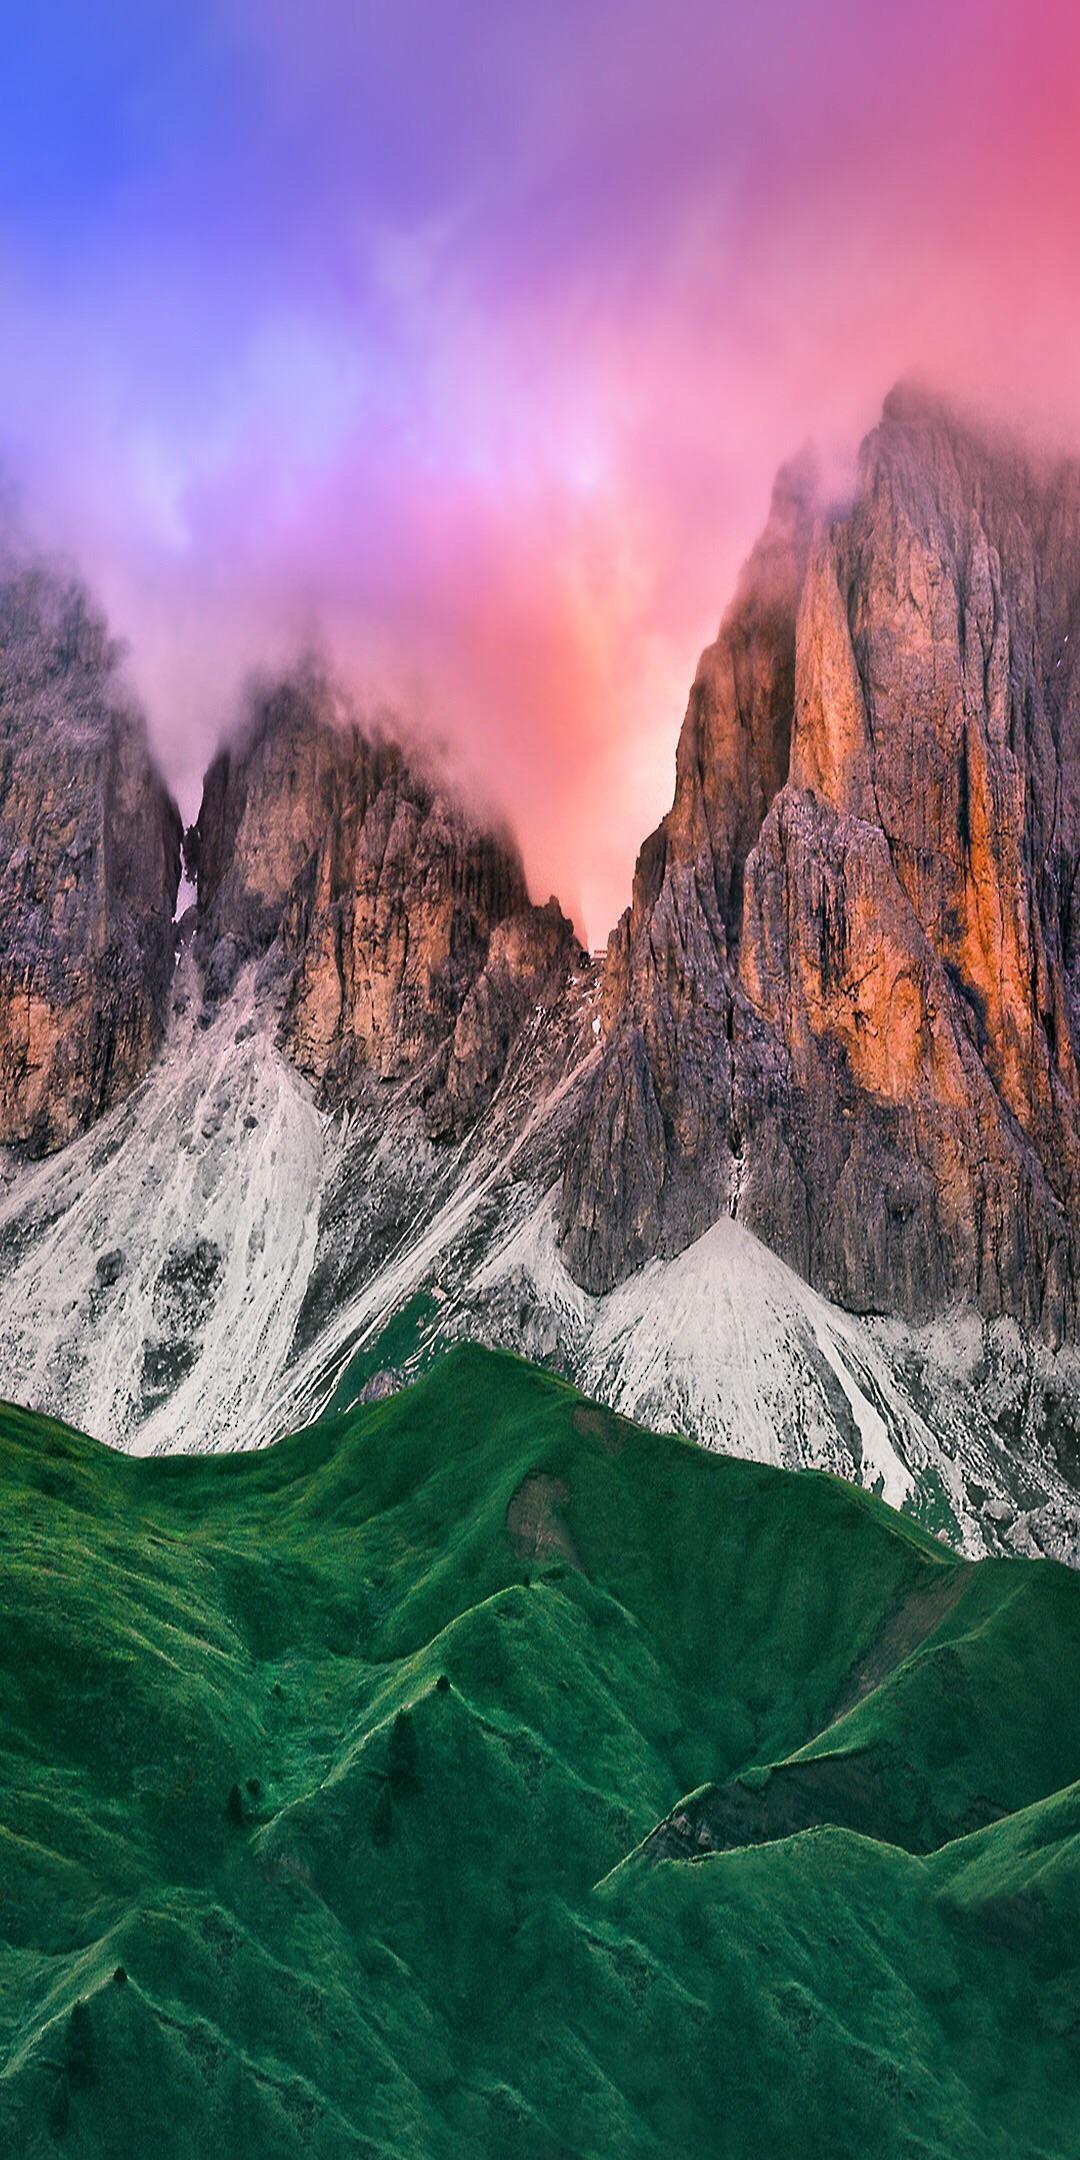 Mountains wallpaper Dessin montagne, Belle photo, Paysage